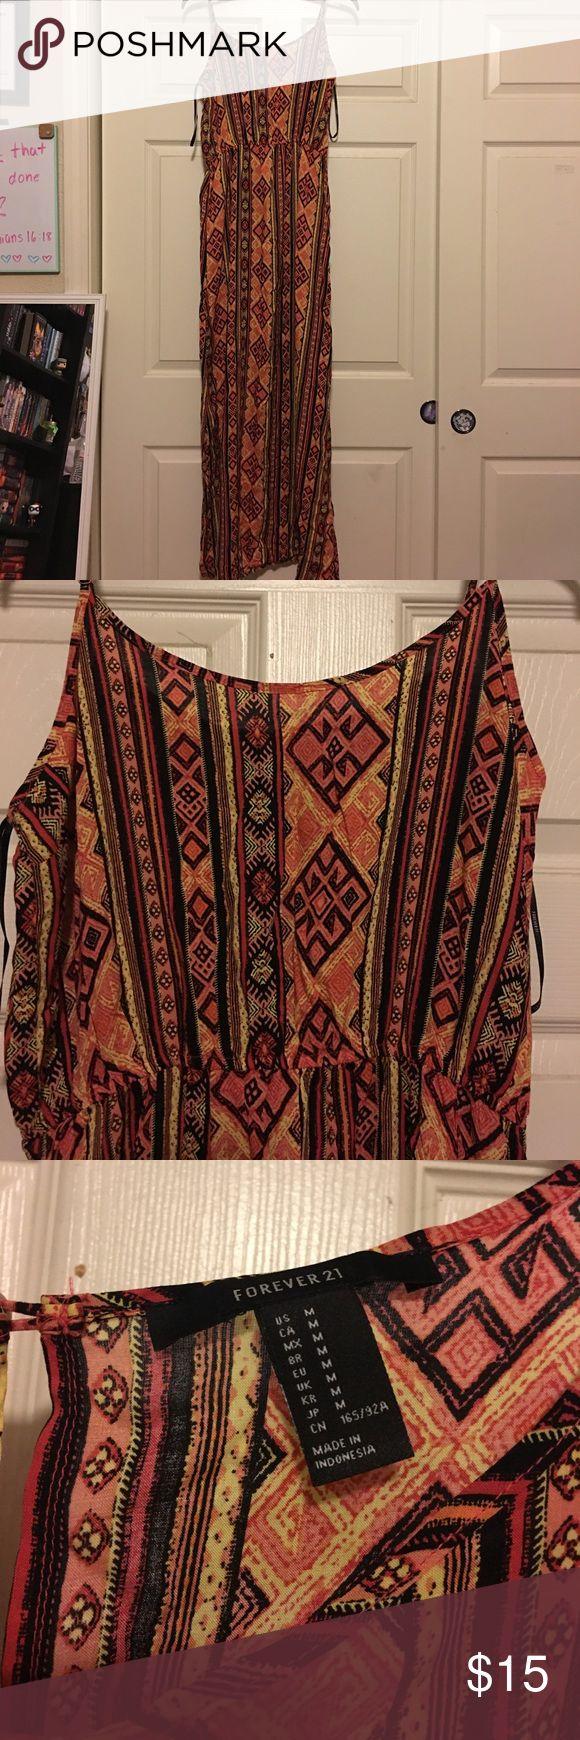 Long Aztec Maxi Dress. Long Aztec Maxi Dress. Lightweight. Forever 21 Dresses Maxi